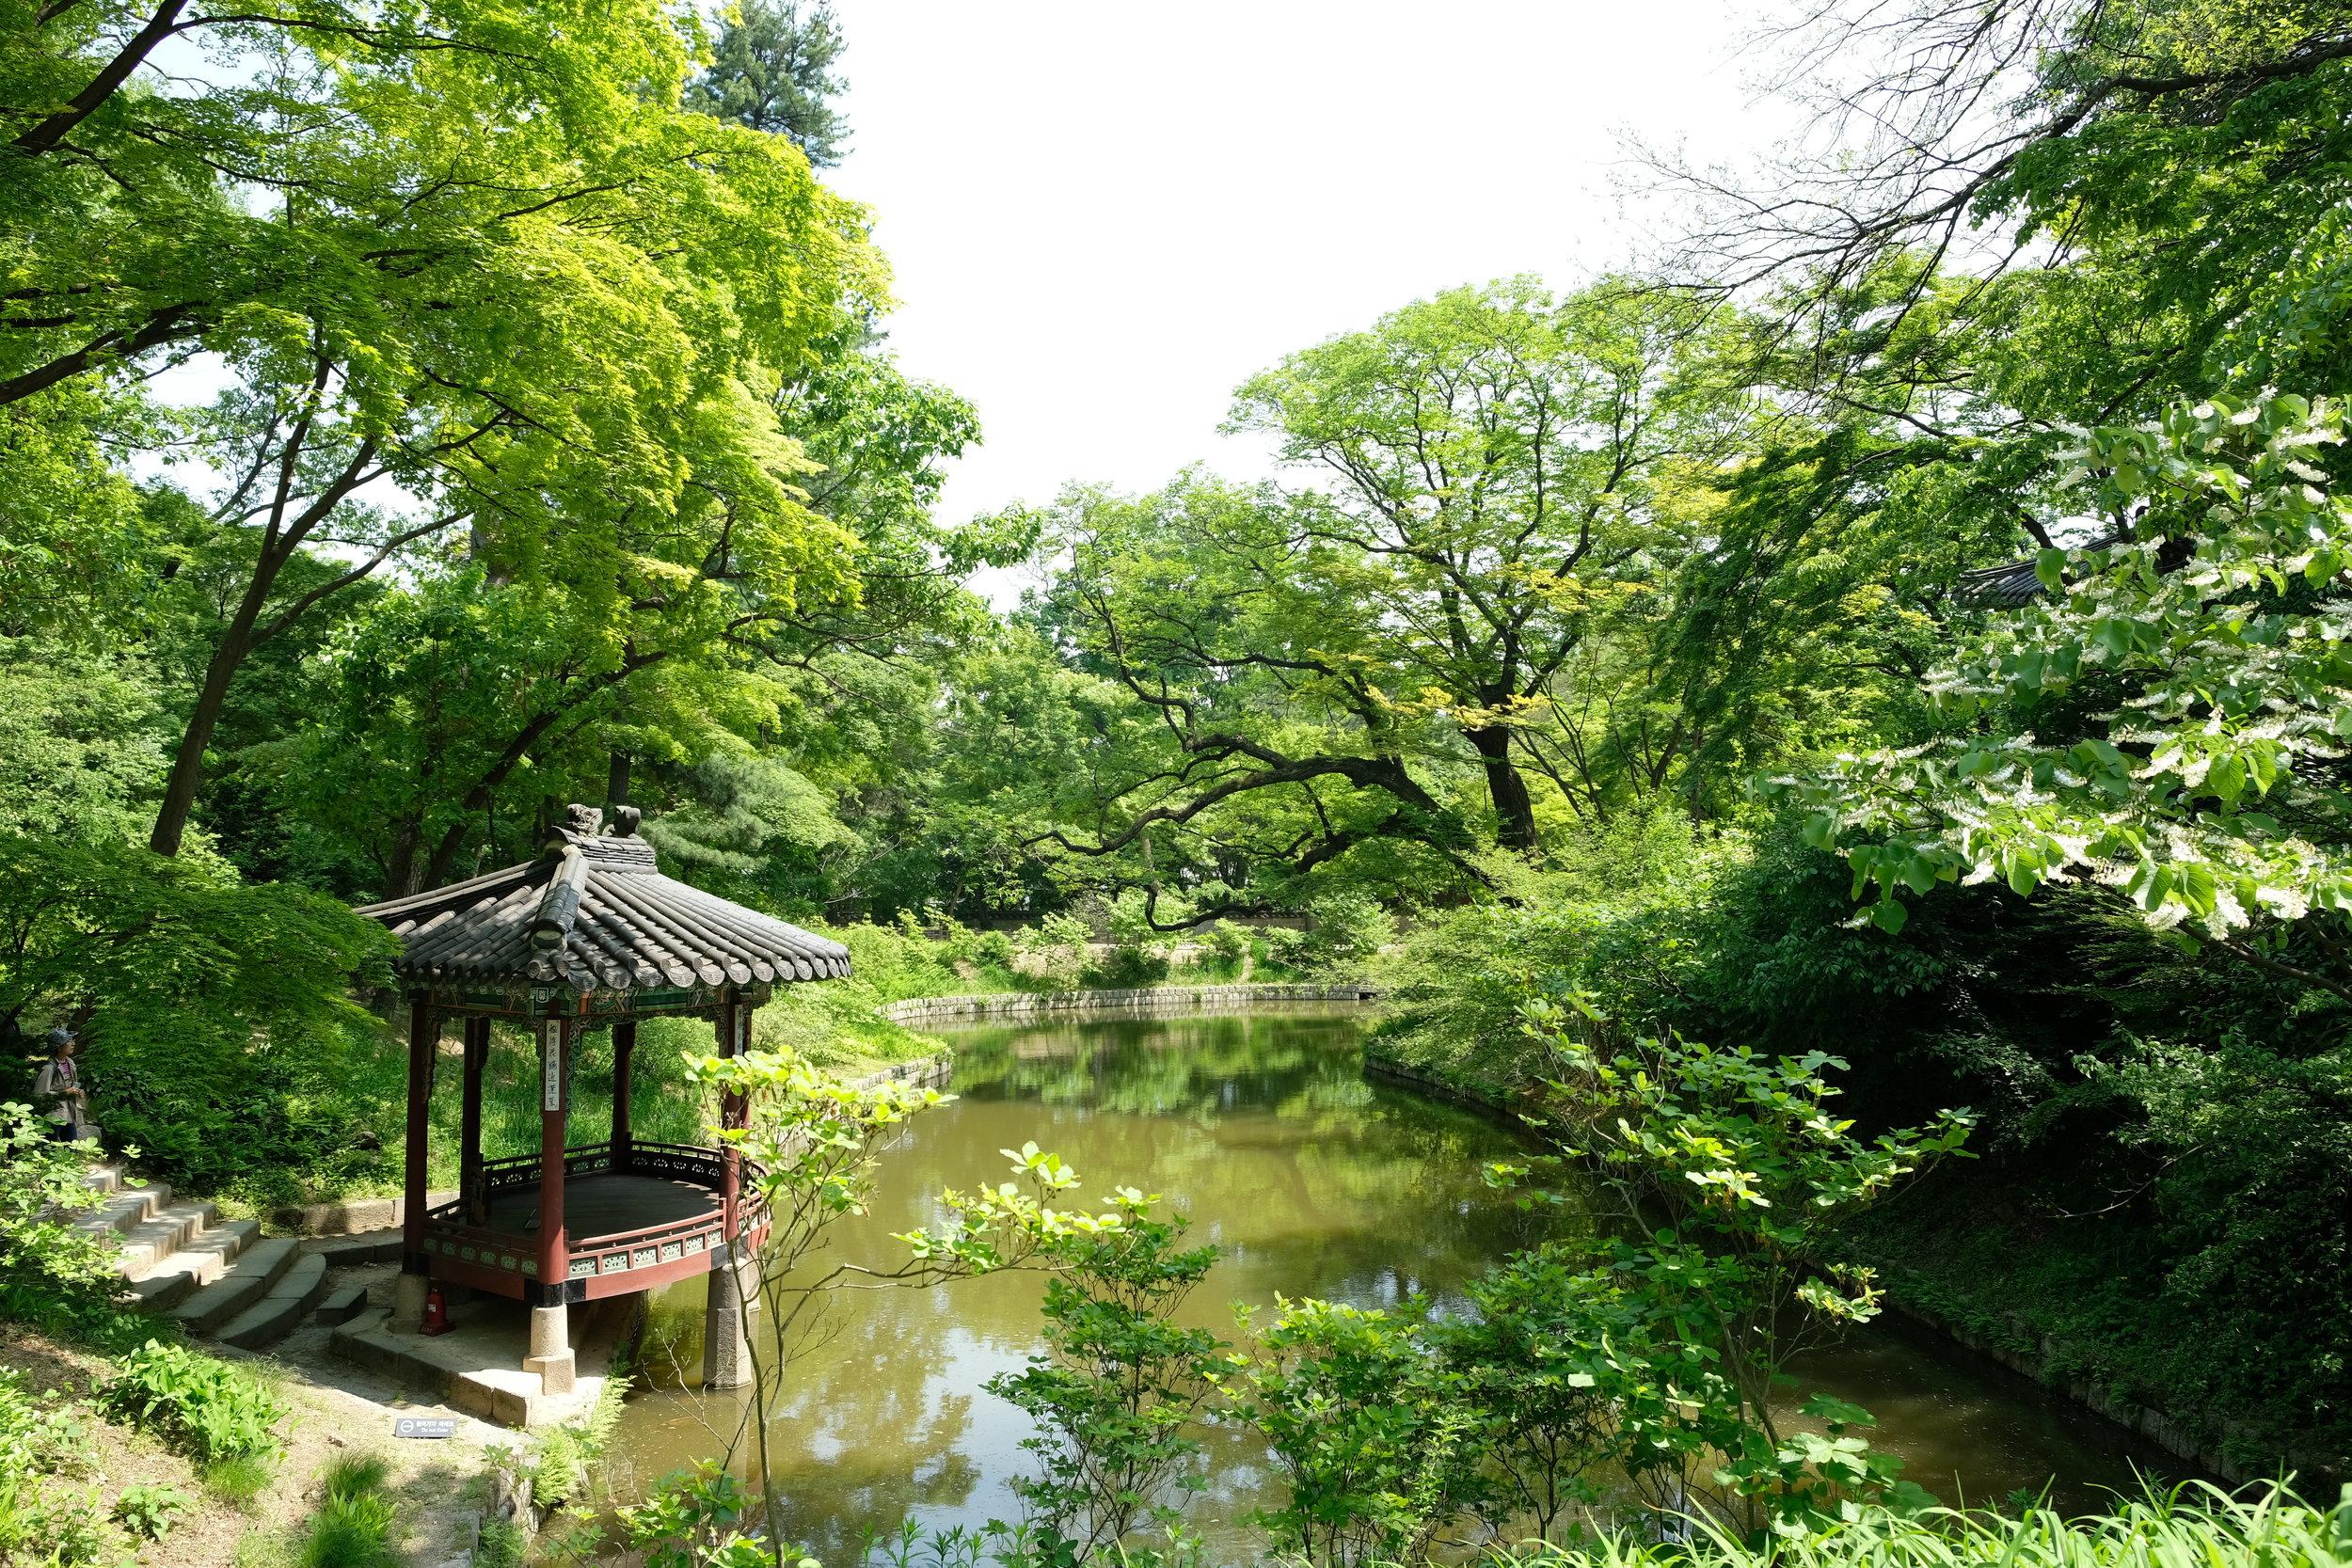 Seoul Changdeokgung Palace5.JPG